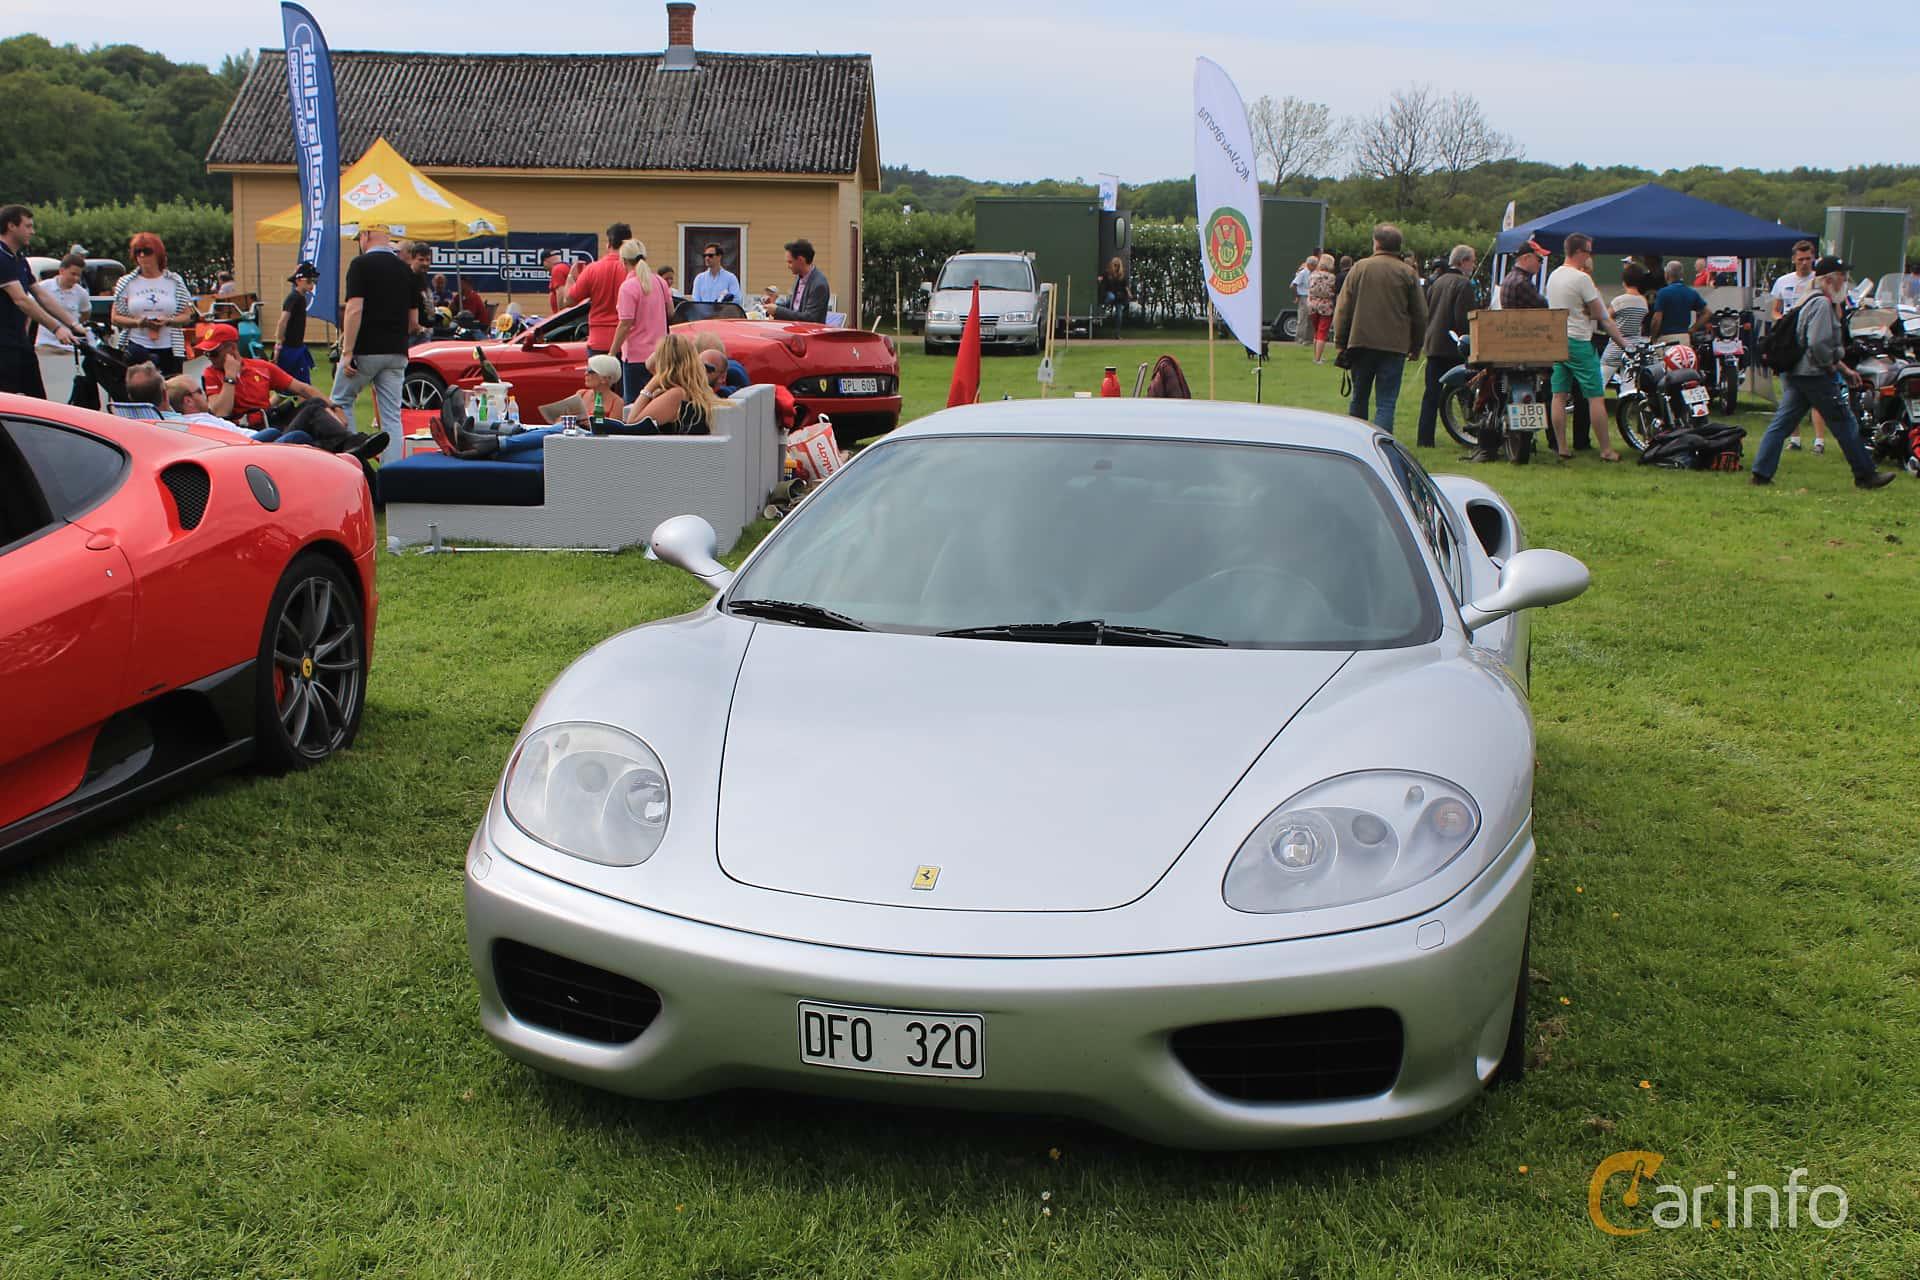 Ferrari 360 Modena 3.6 V8 Sequential, 400hp, 2001 at Tjolöholm Classic Motor 2014